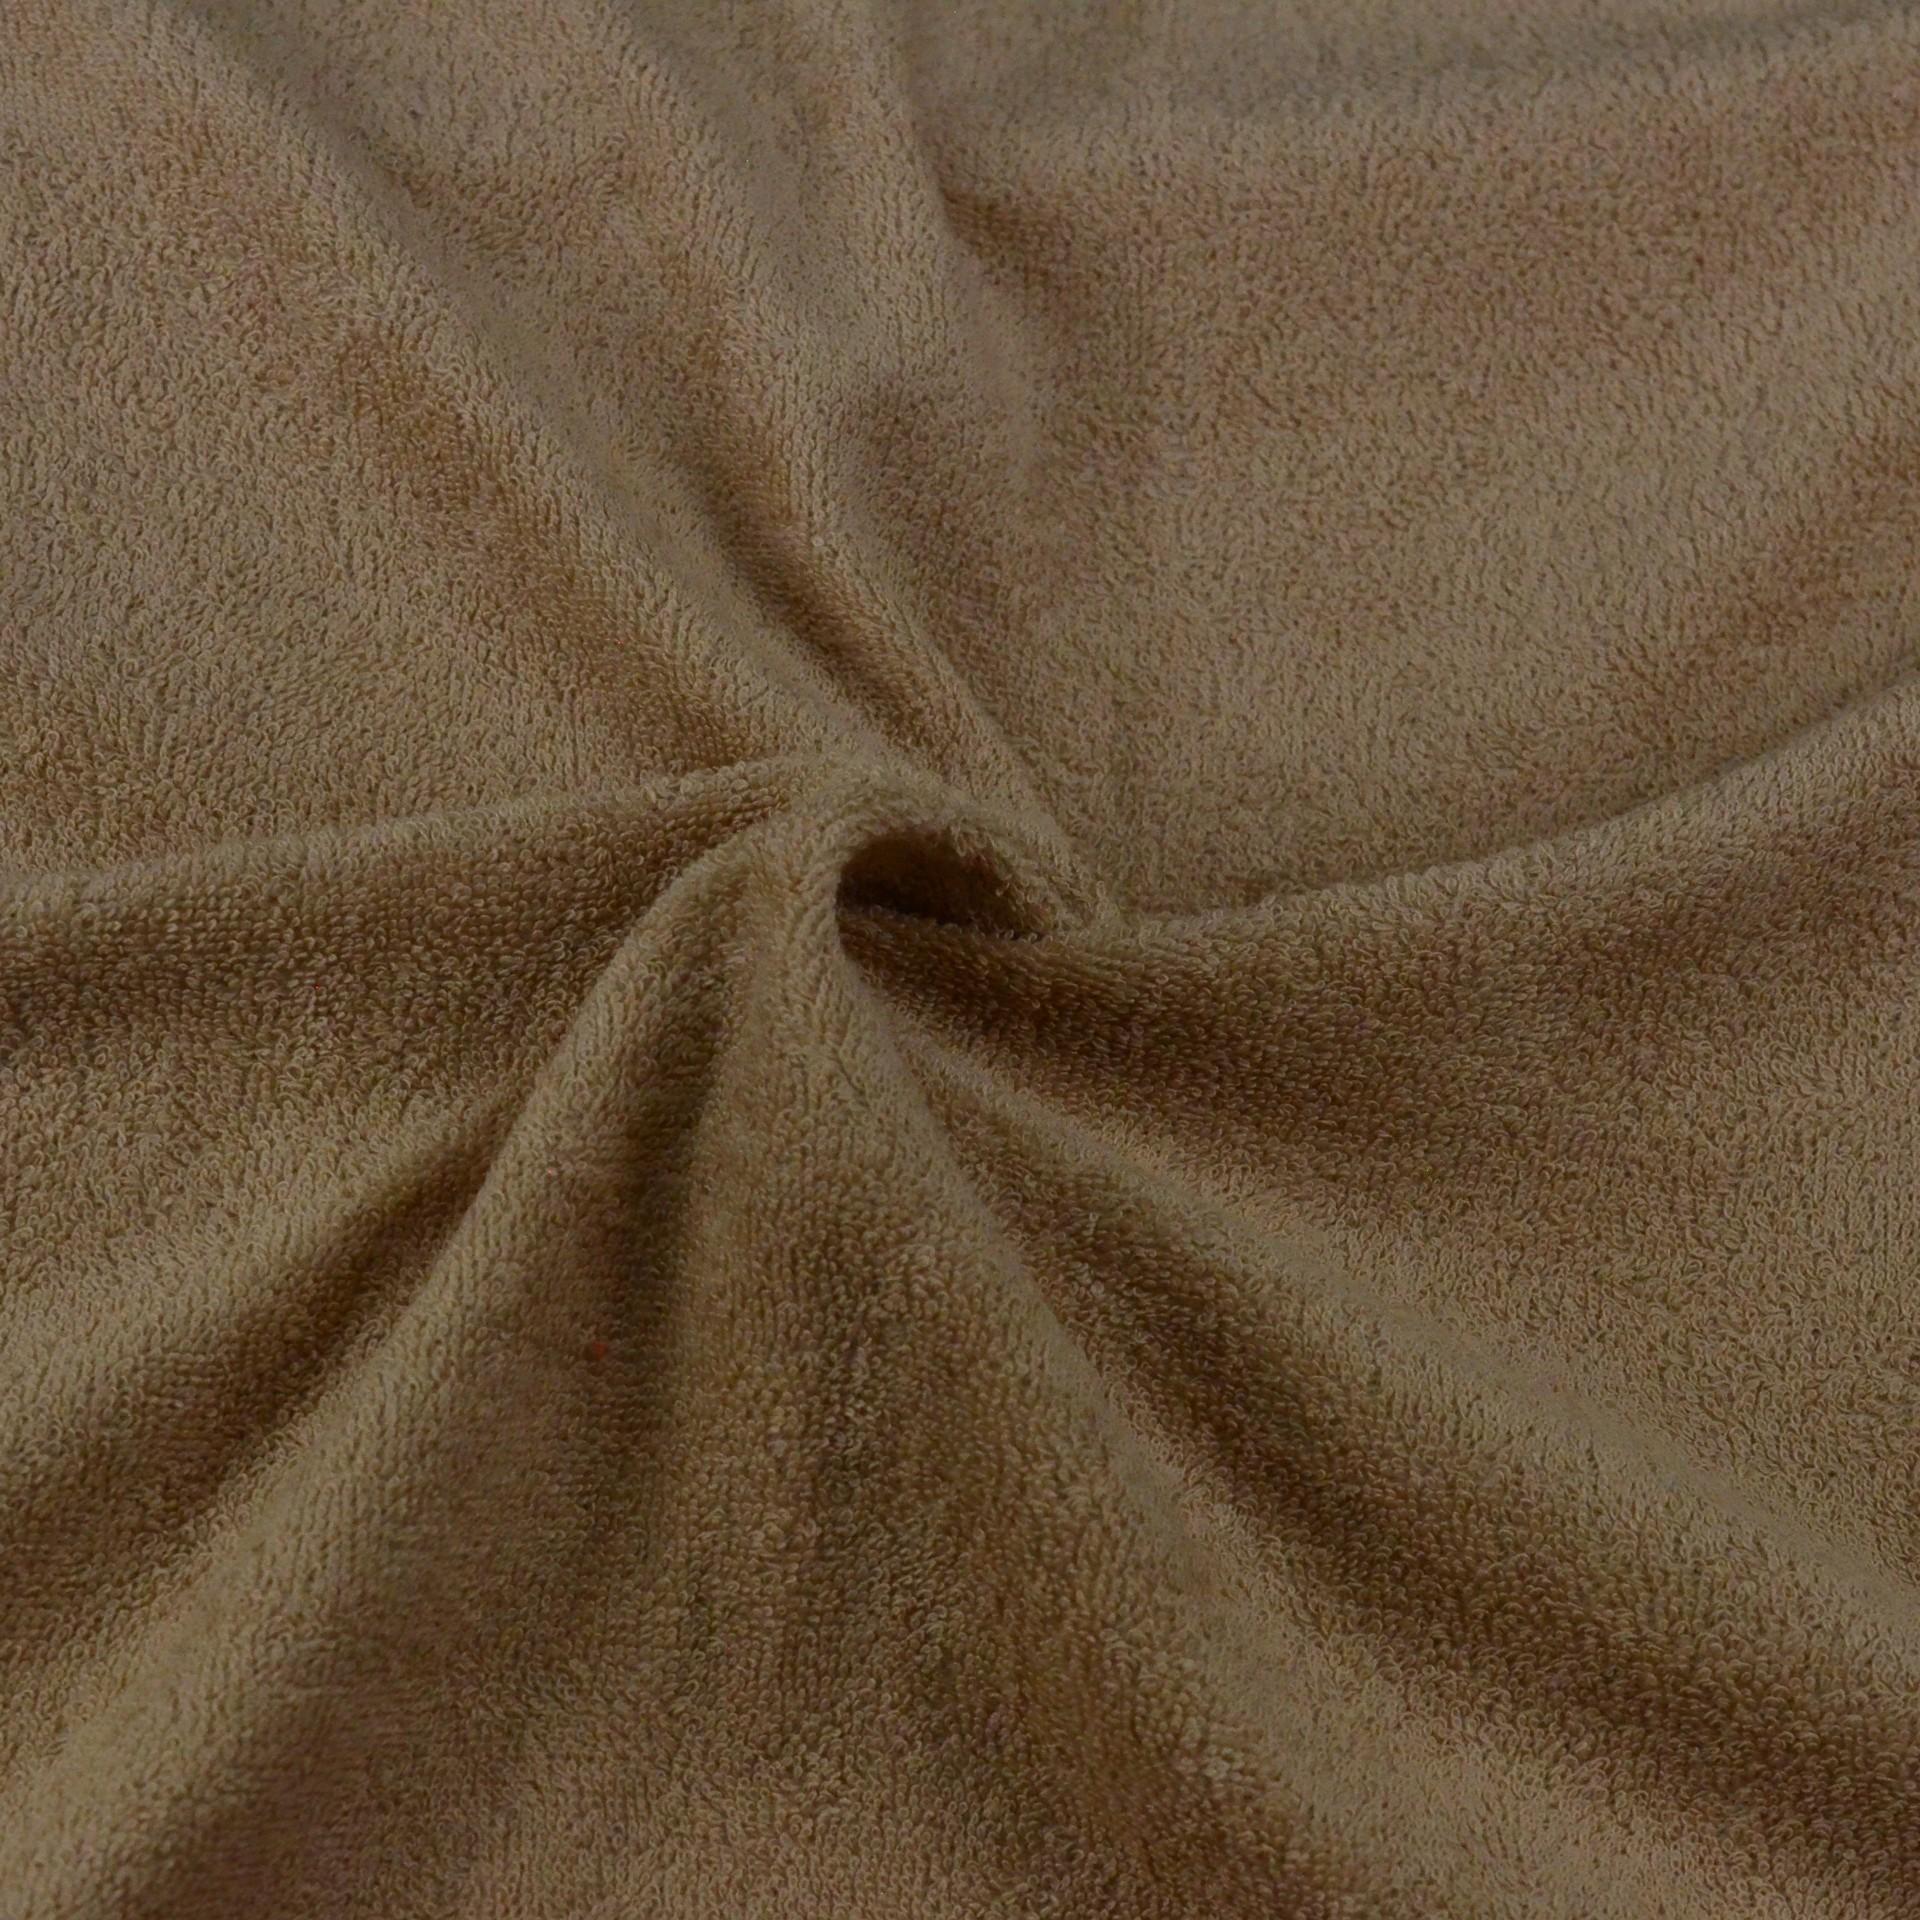 Froté prostěradlo béžové, Výběr rozměru - 120x200cm